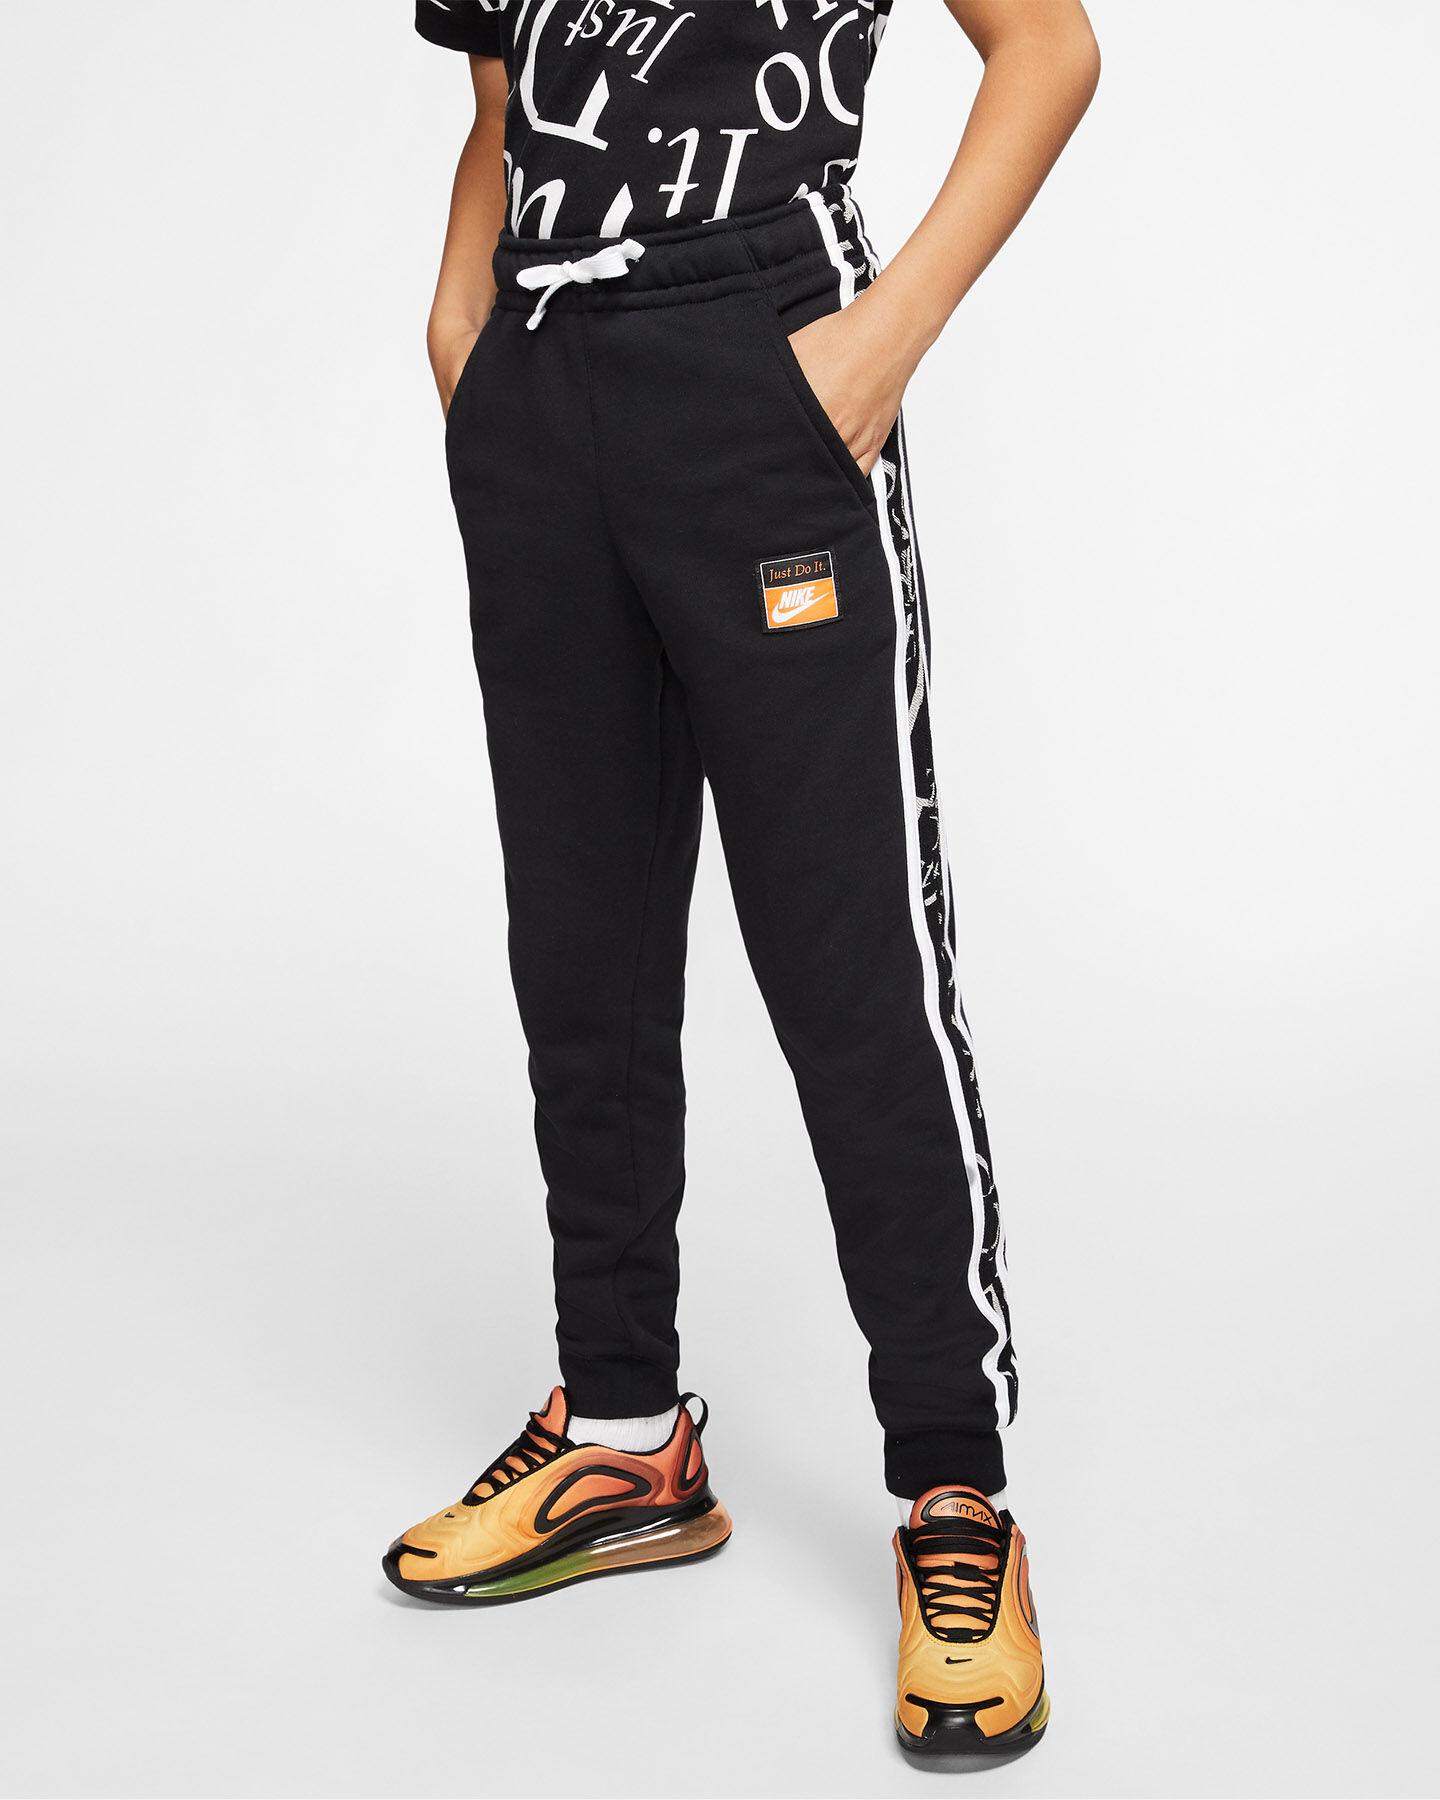 Pantalone NIKE LETTER JR S5164571 scatto 2